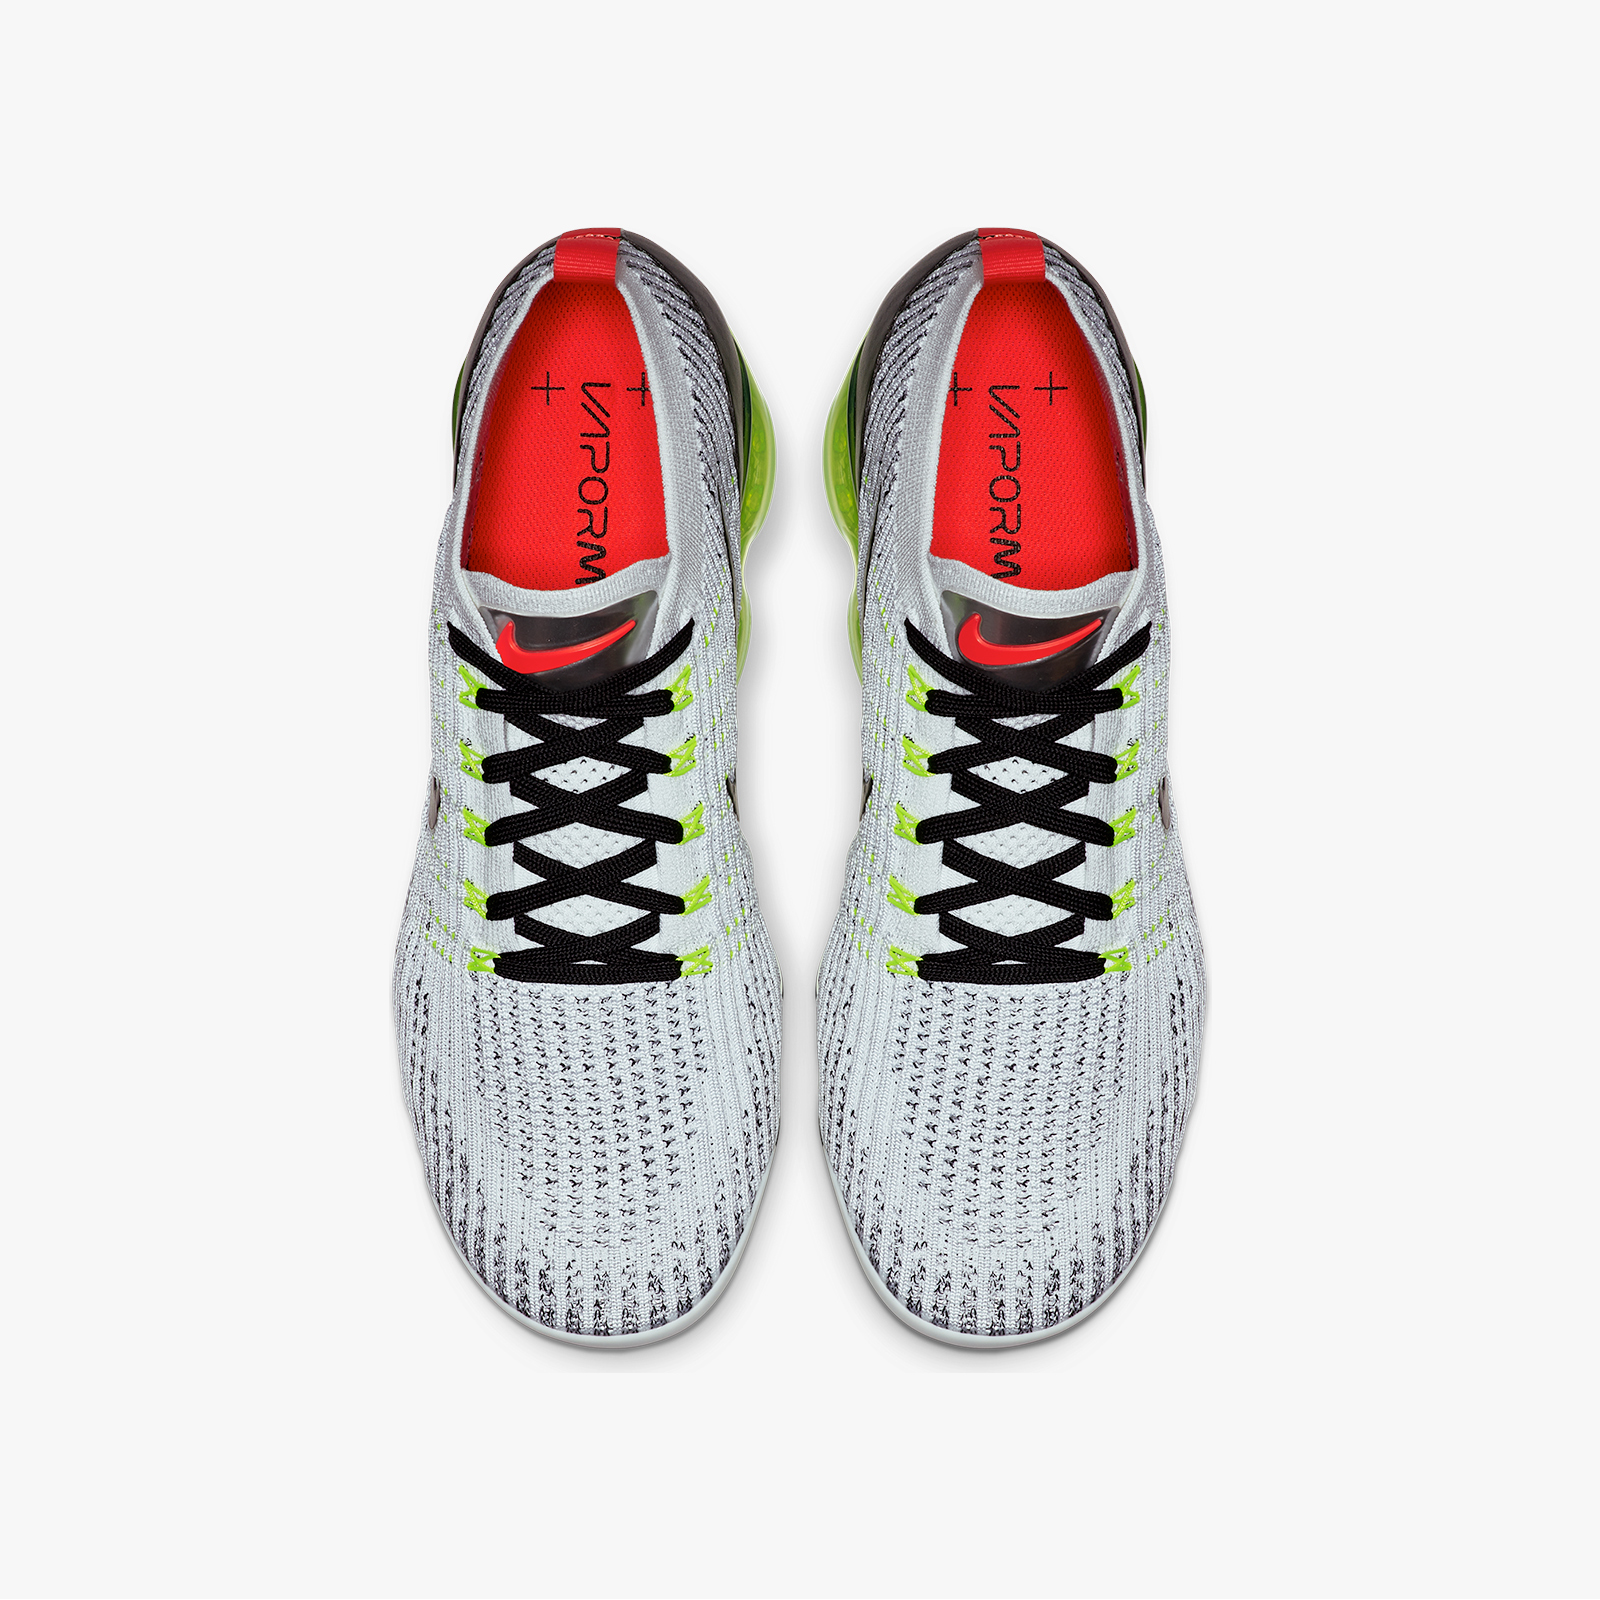 7389d4f0ef5 Nike Air Vapormax Flyknit 3 - Aj6900-100 - Sneakersnstuff